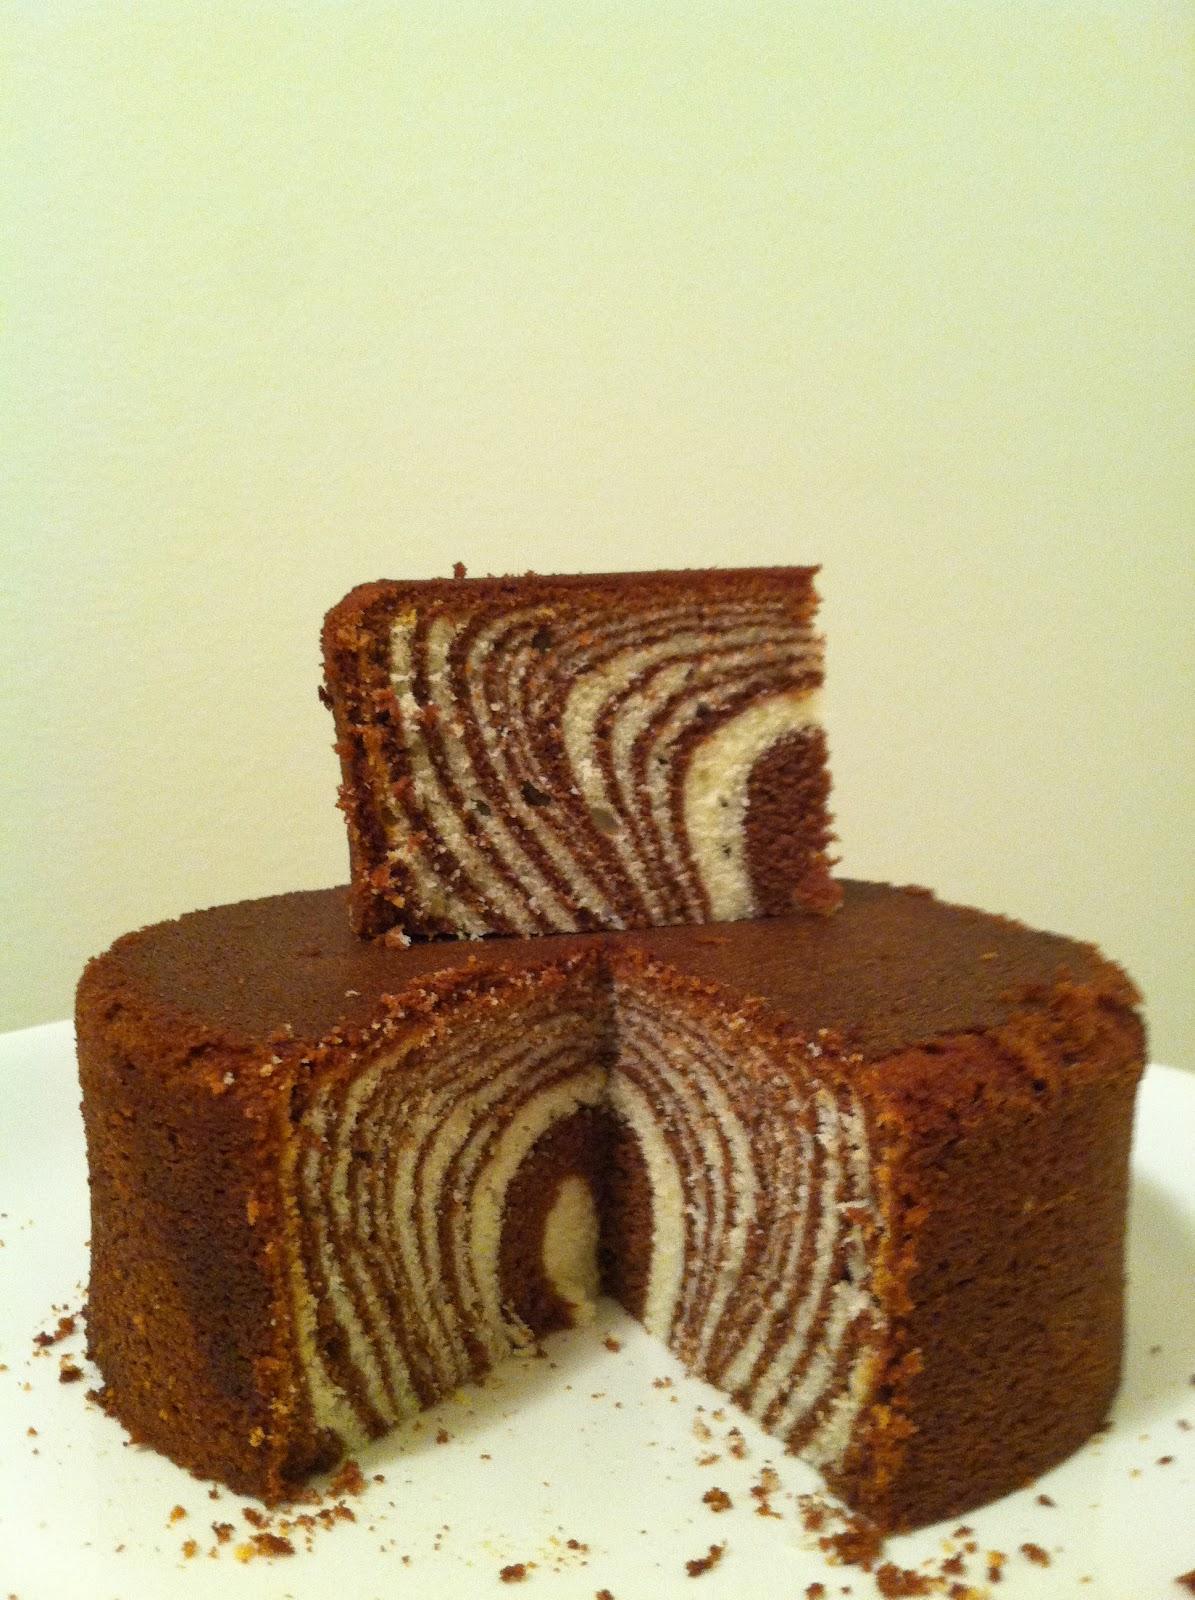 below slice of zebra cake atop the cake